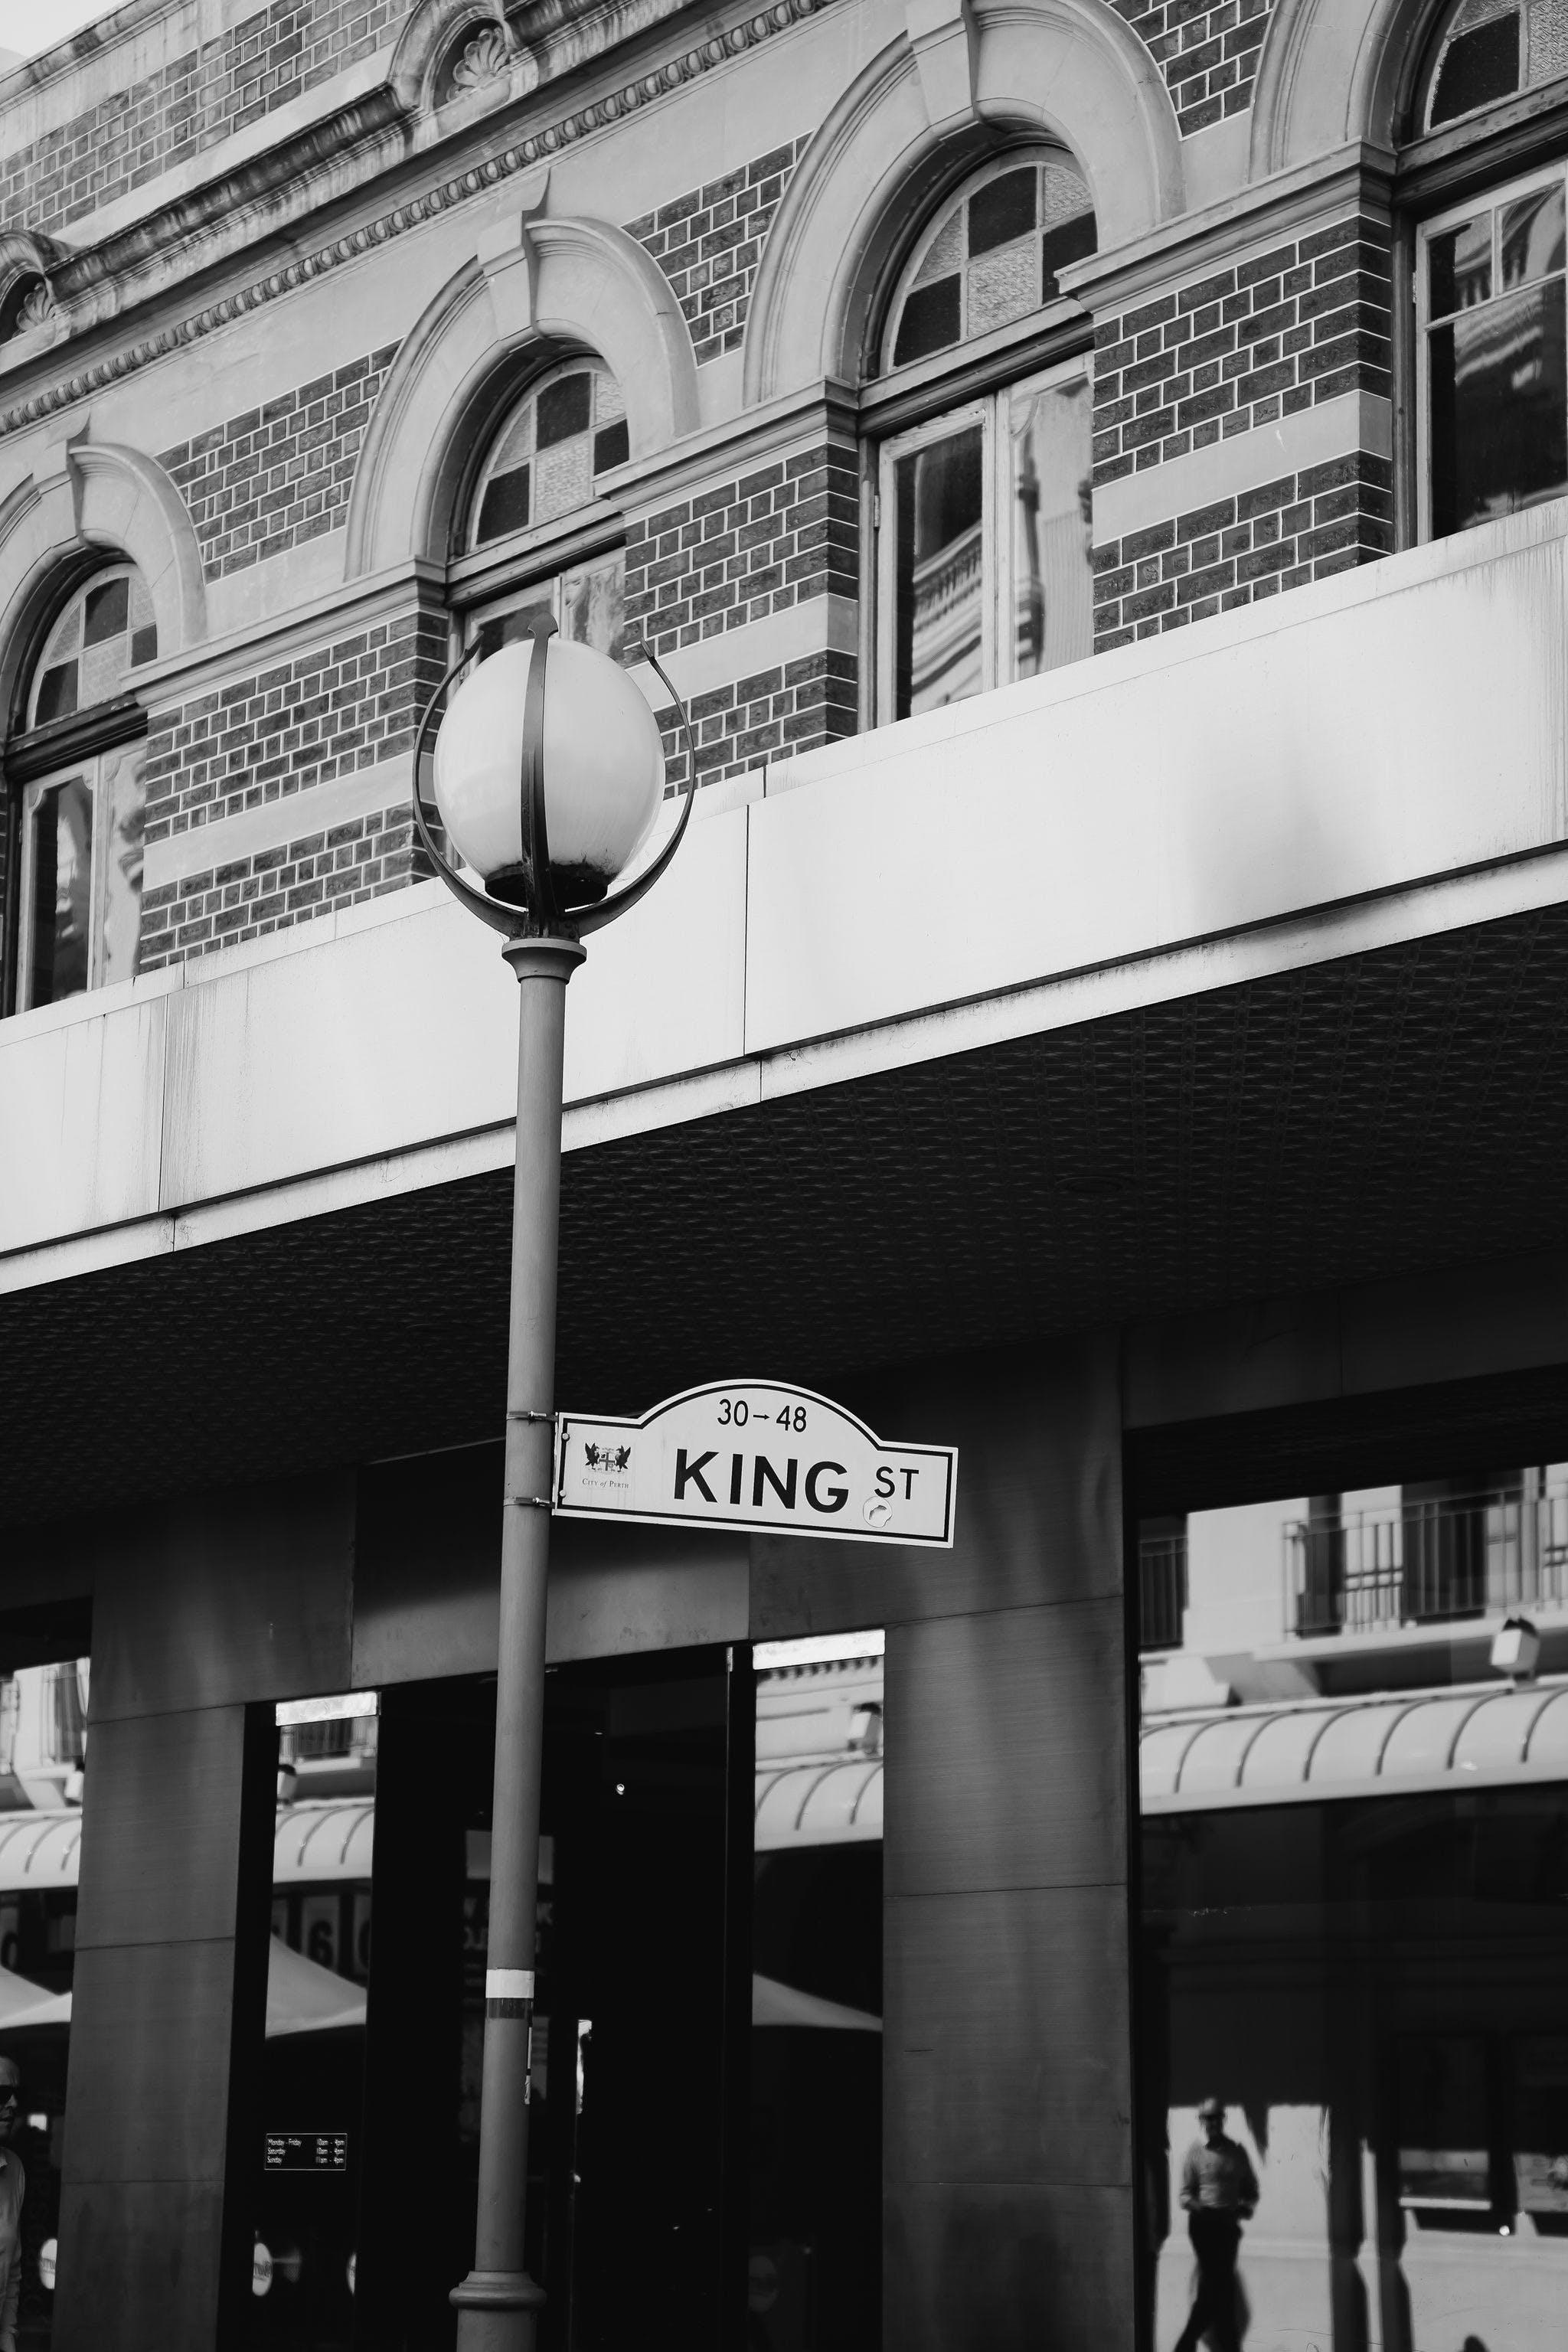 The King Street Precinct, Perth, Western Australia